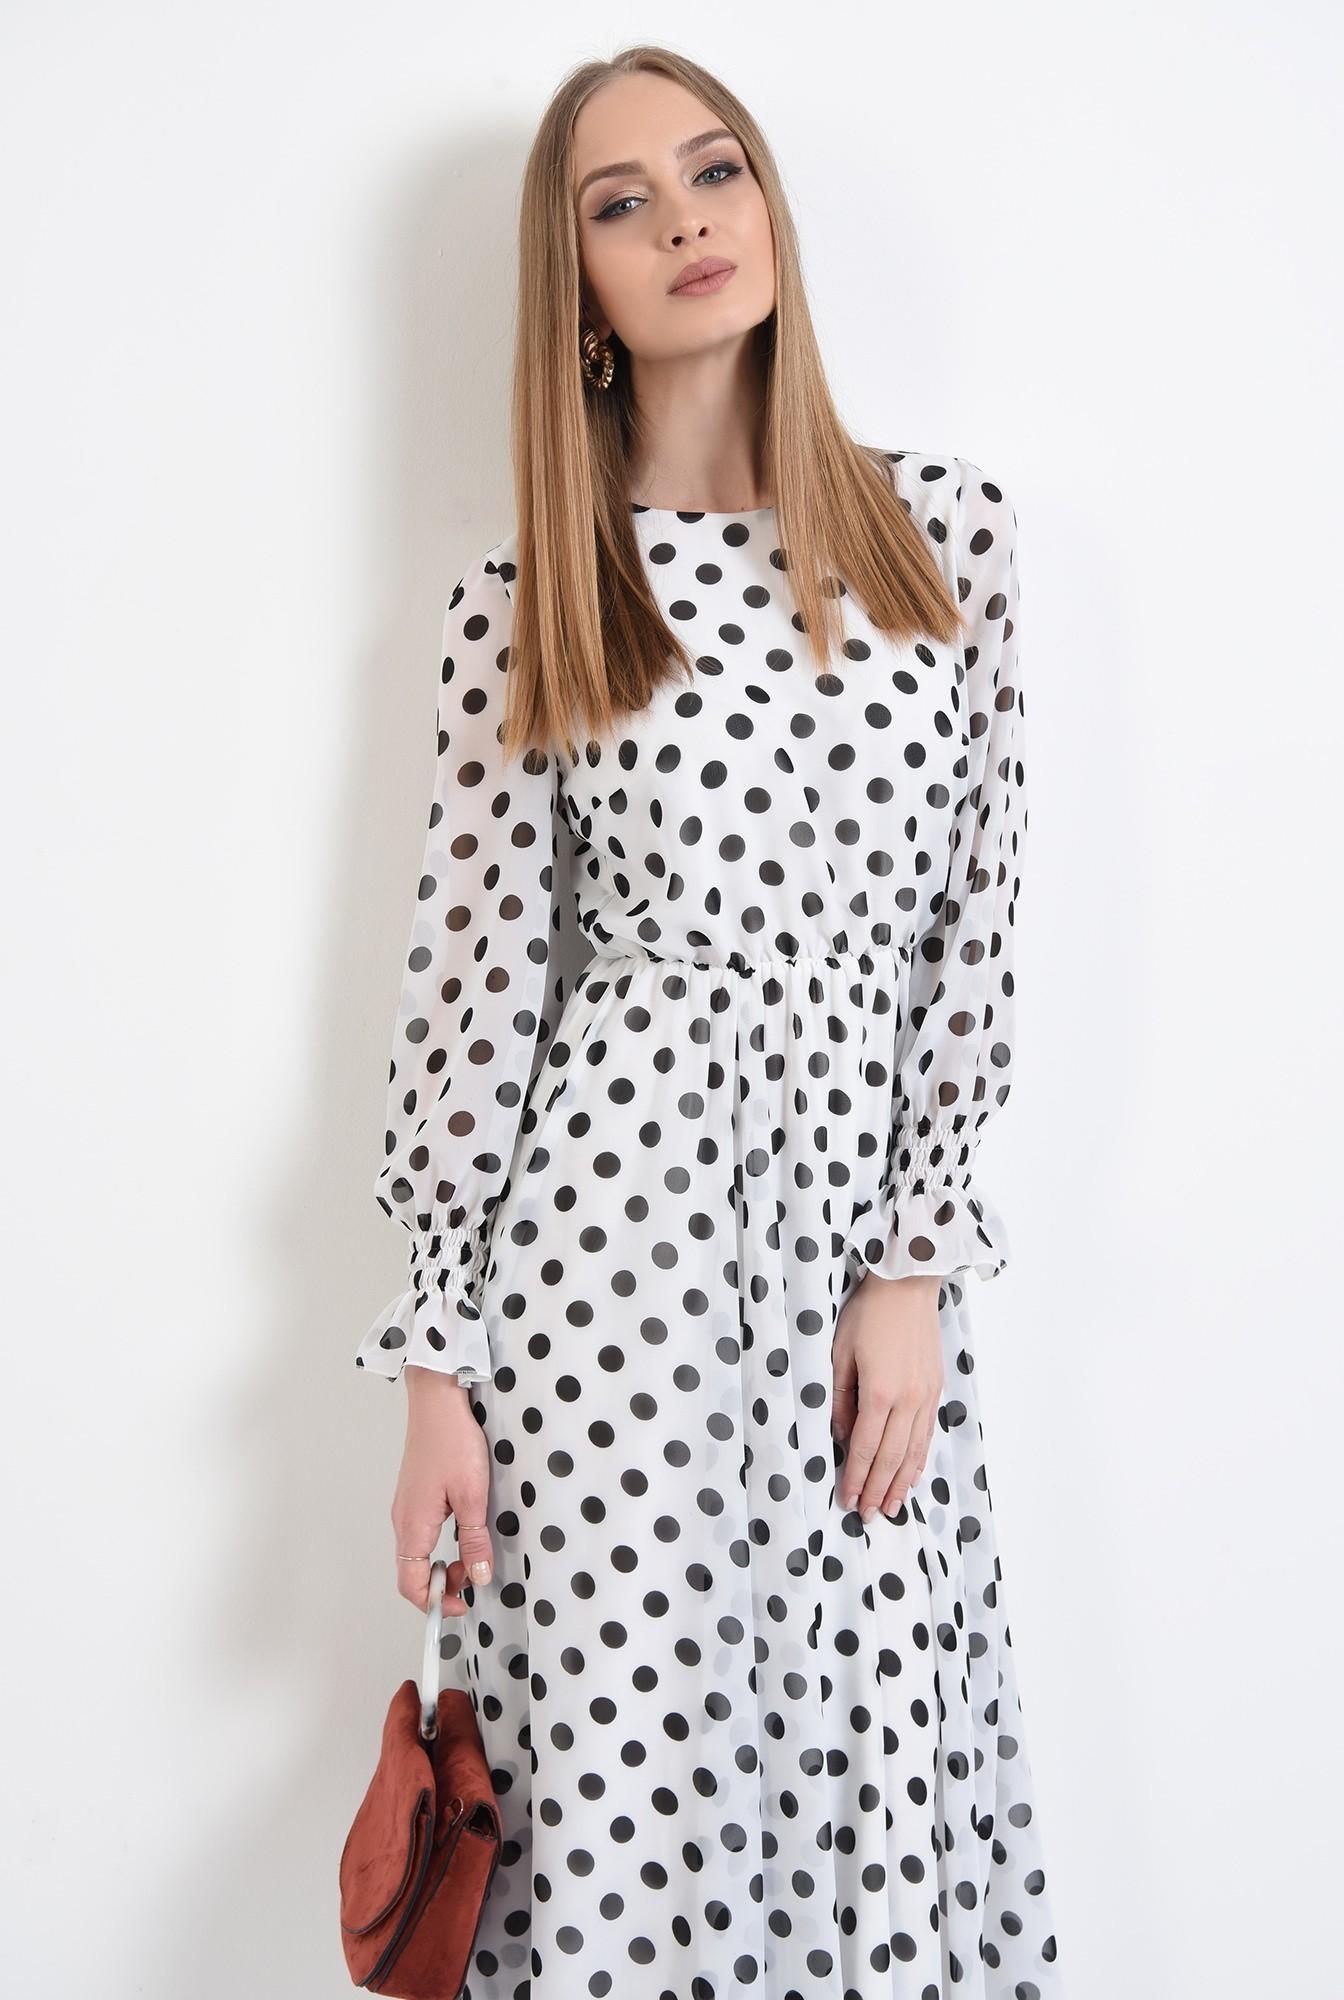 2 - 360 - rochie lunga, clos, cu buline, alb-negru, mansete volan, Poema